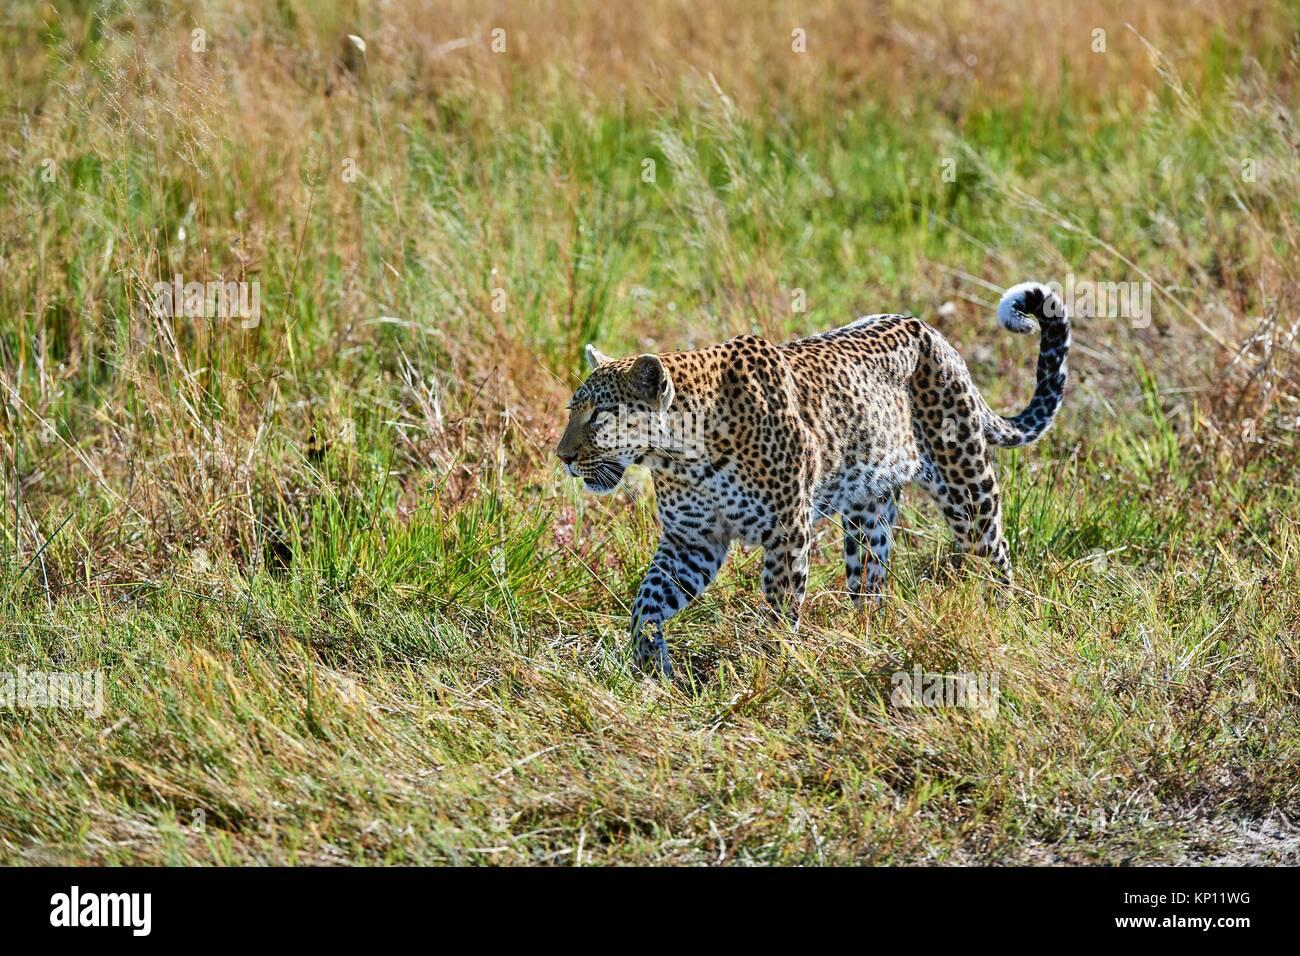 African leopard female (Panthera pardus) walking through grassland. Moremi National Park, Okavango delta, Botswana, - Stock Image